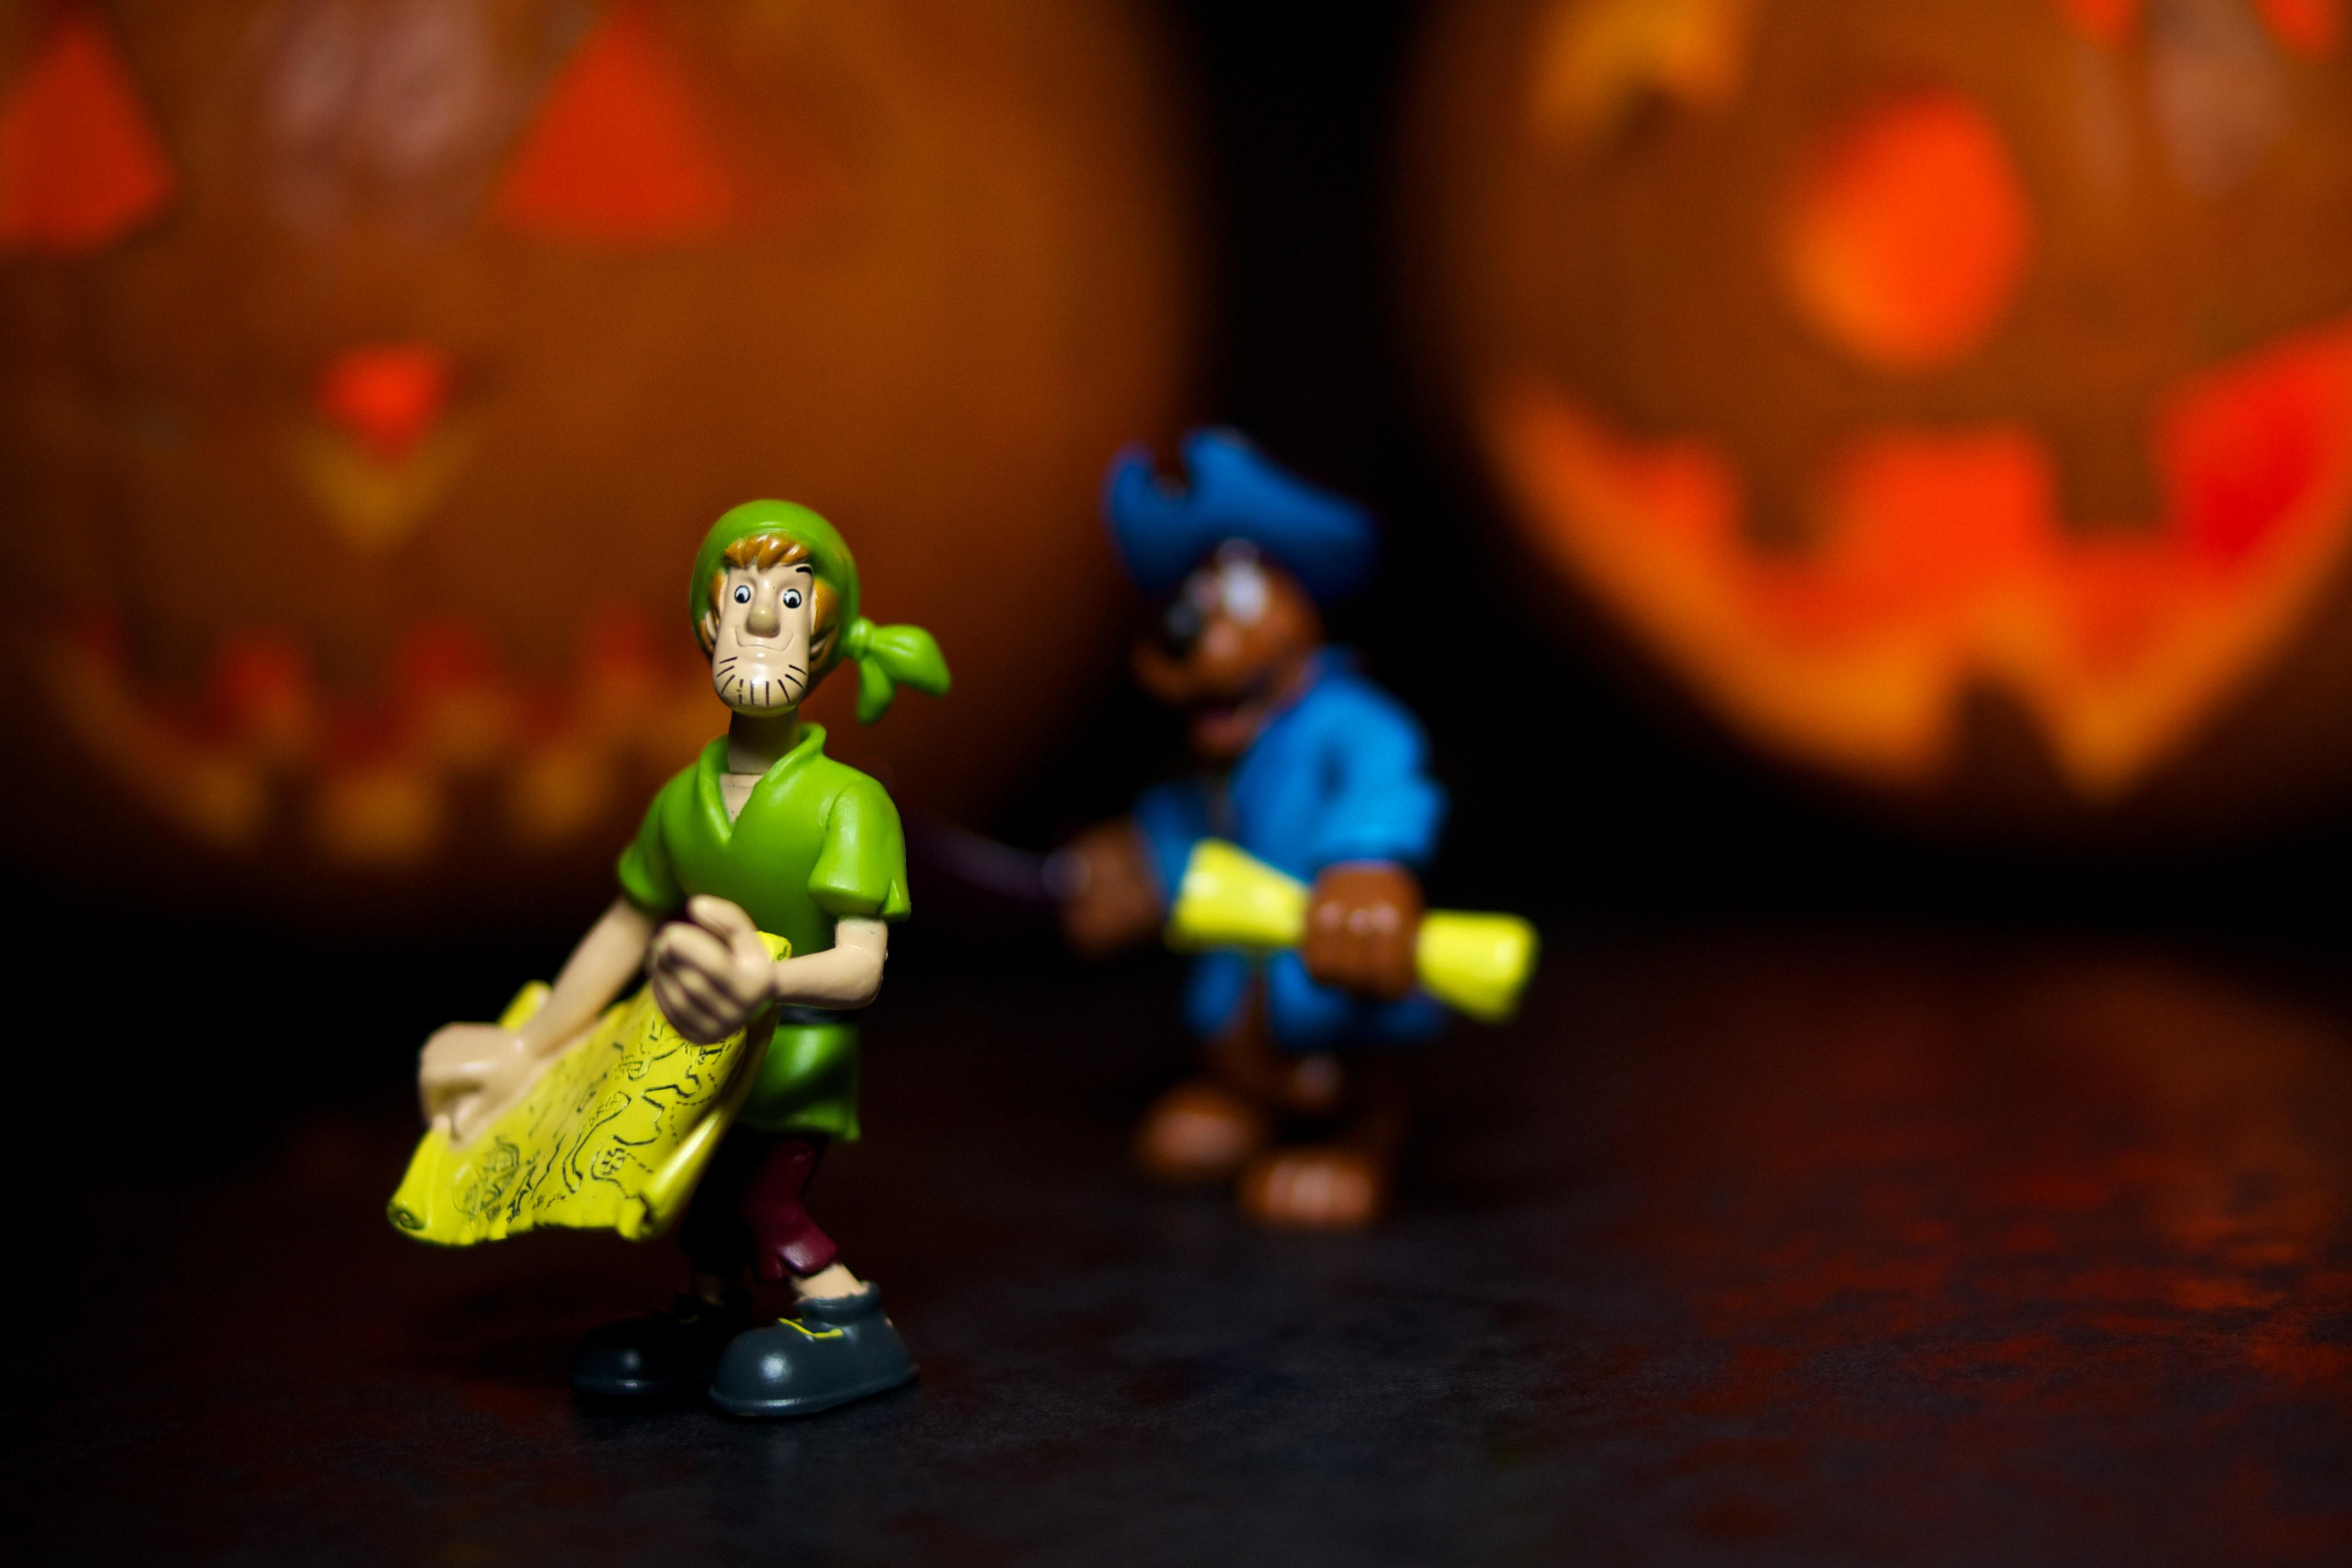 Wonderful Wallpaper Halloween Scooby Doo - pumpkin-halloween-toy-stilllife-sony-shaggy-messing-jackolantern-screenshot-doo-a700-scooby-jackoh-computer-wallpaper-421787  Image_426614.jpg